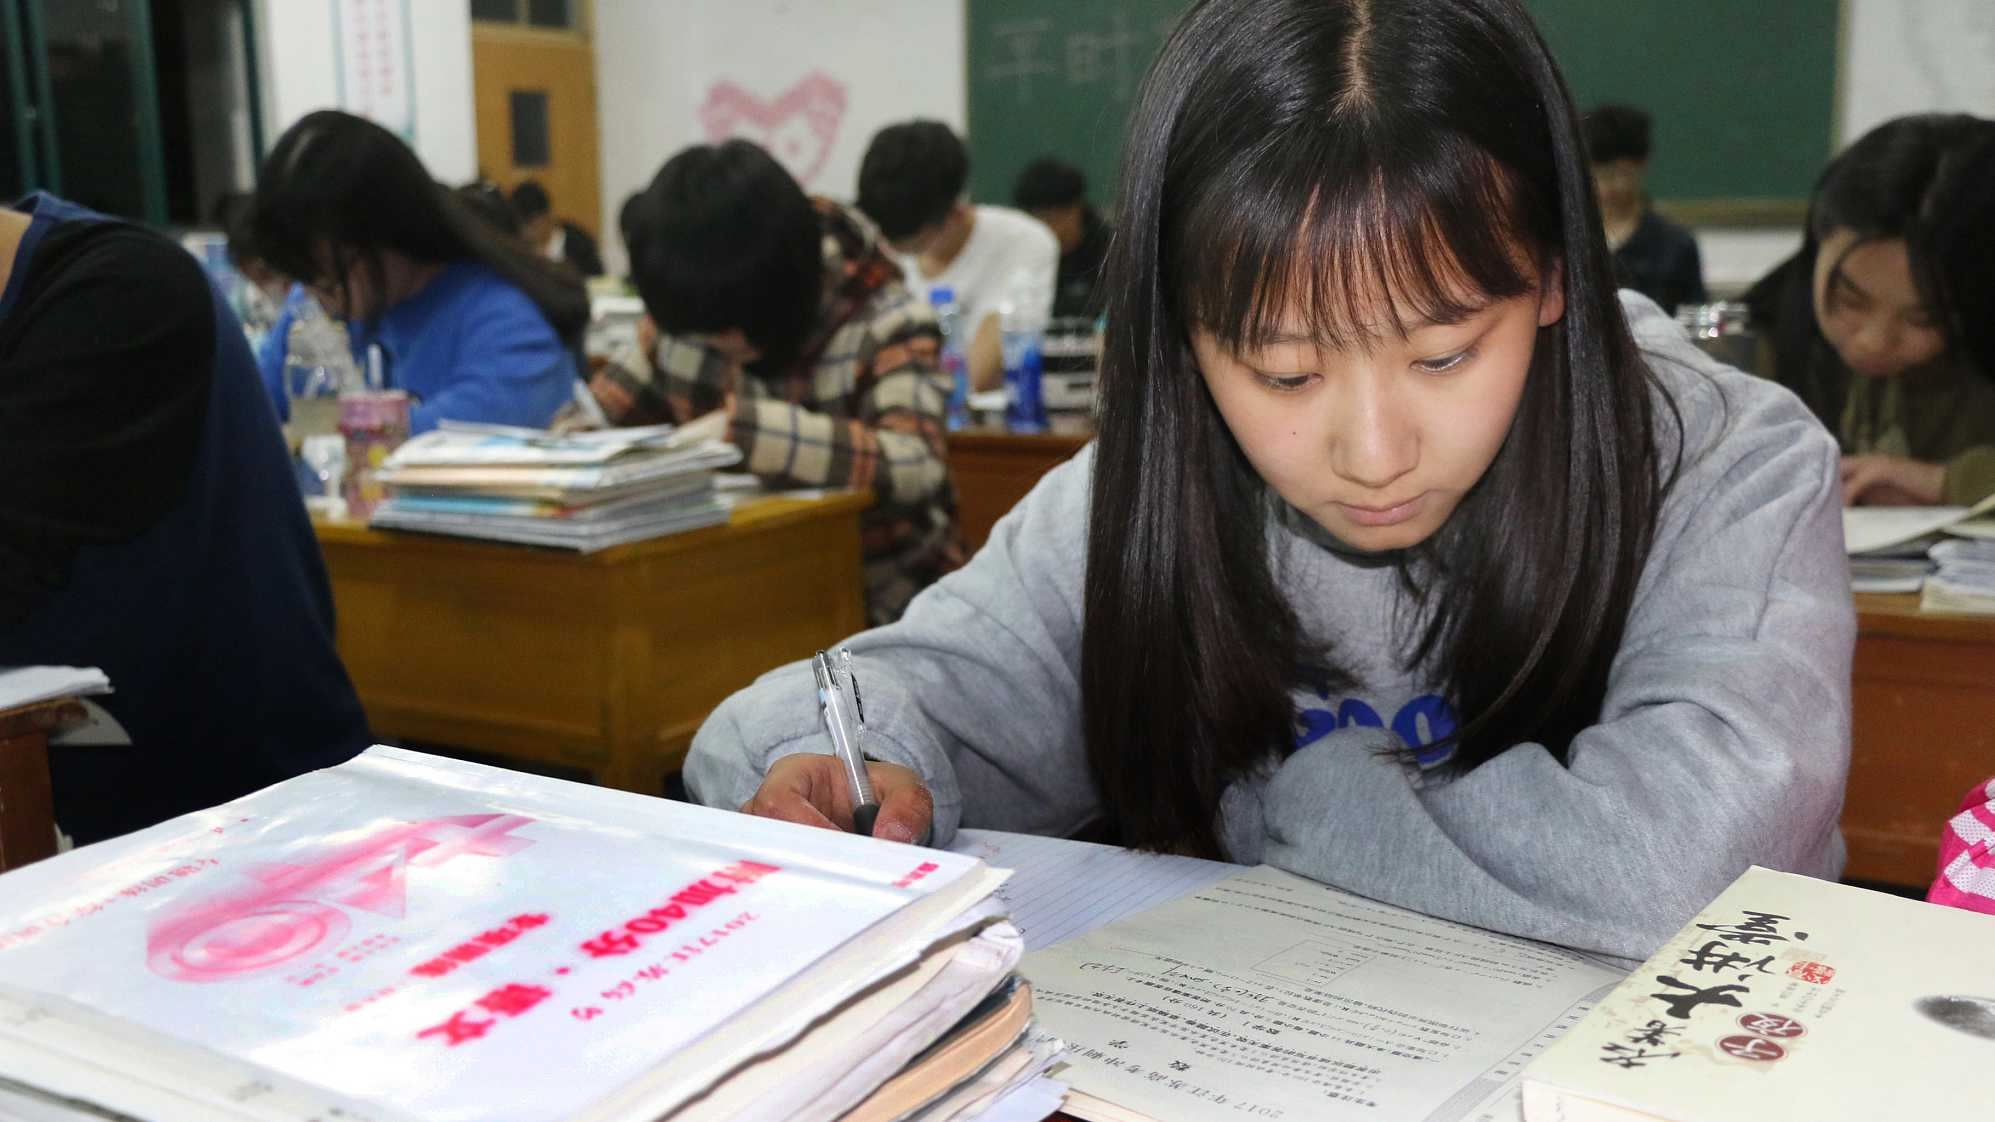 China to establish national platform for education survey research